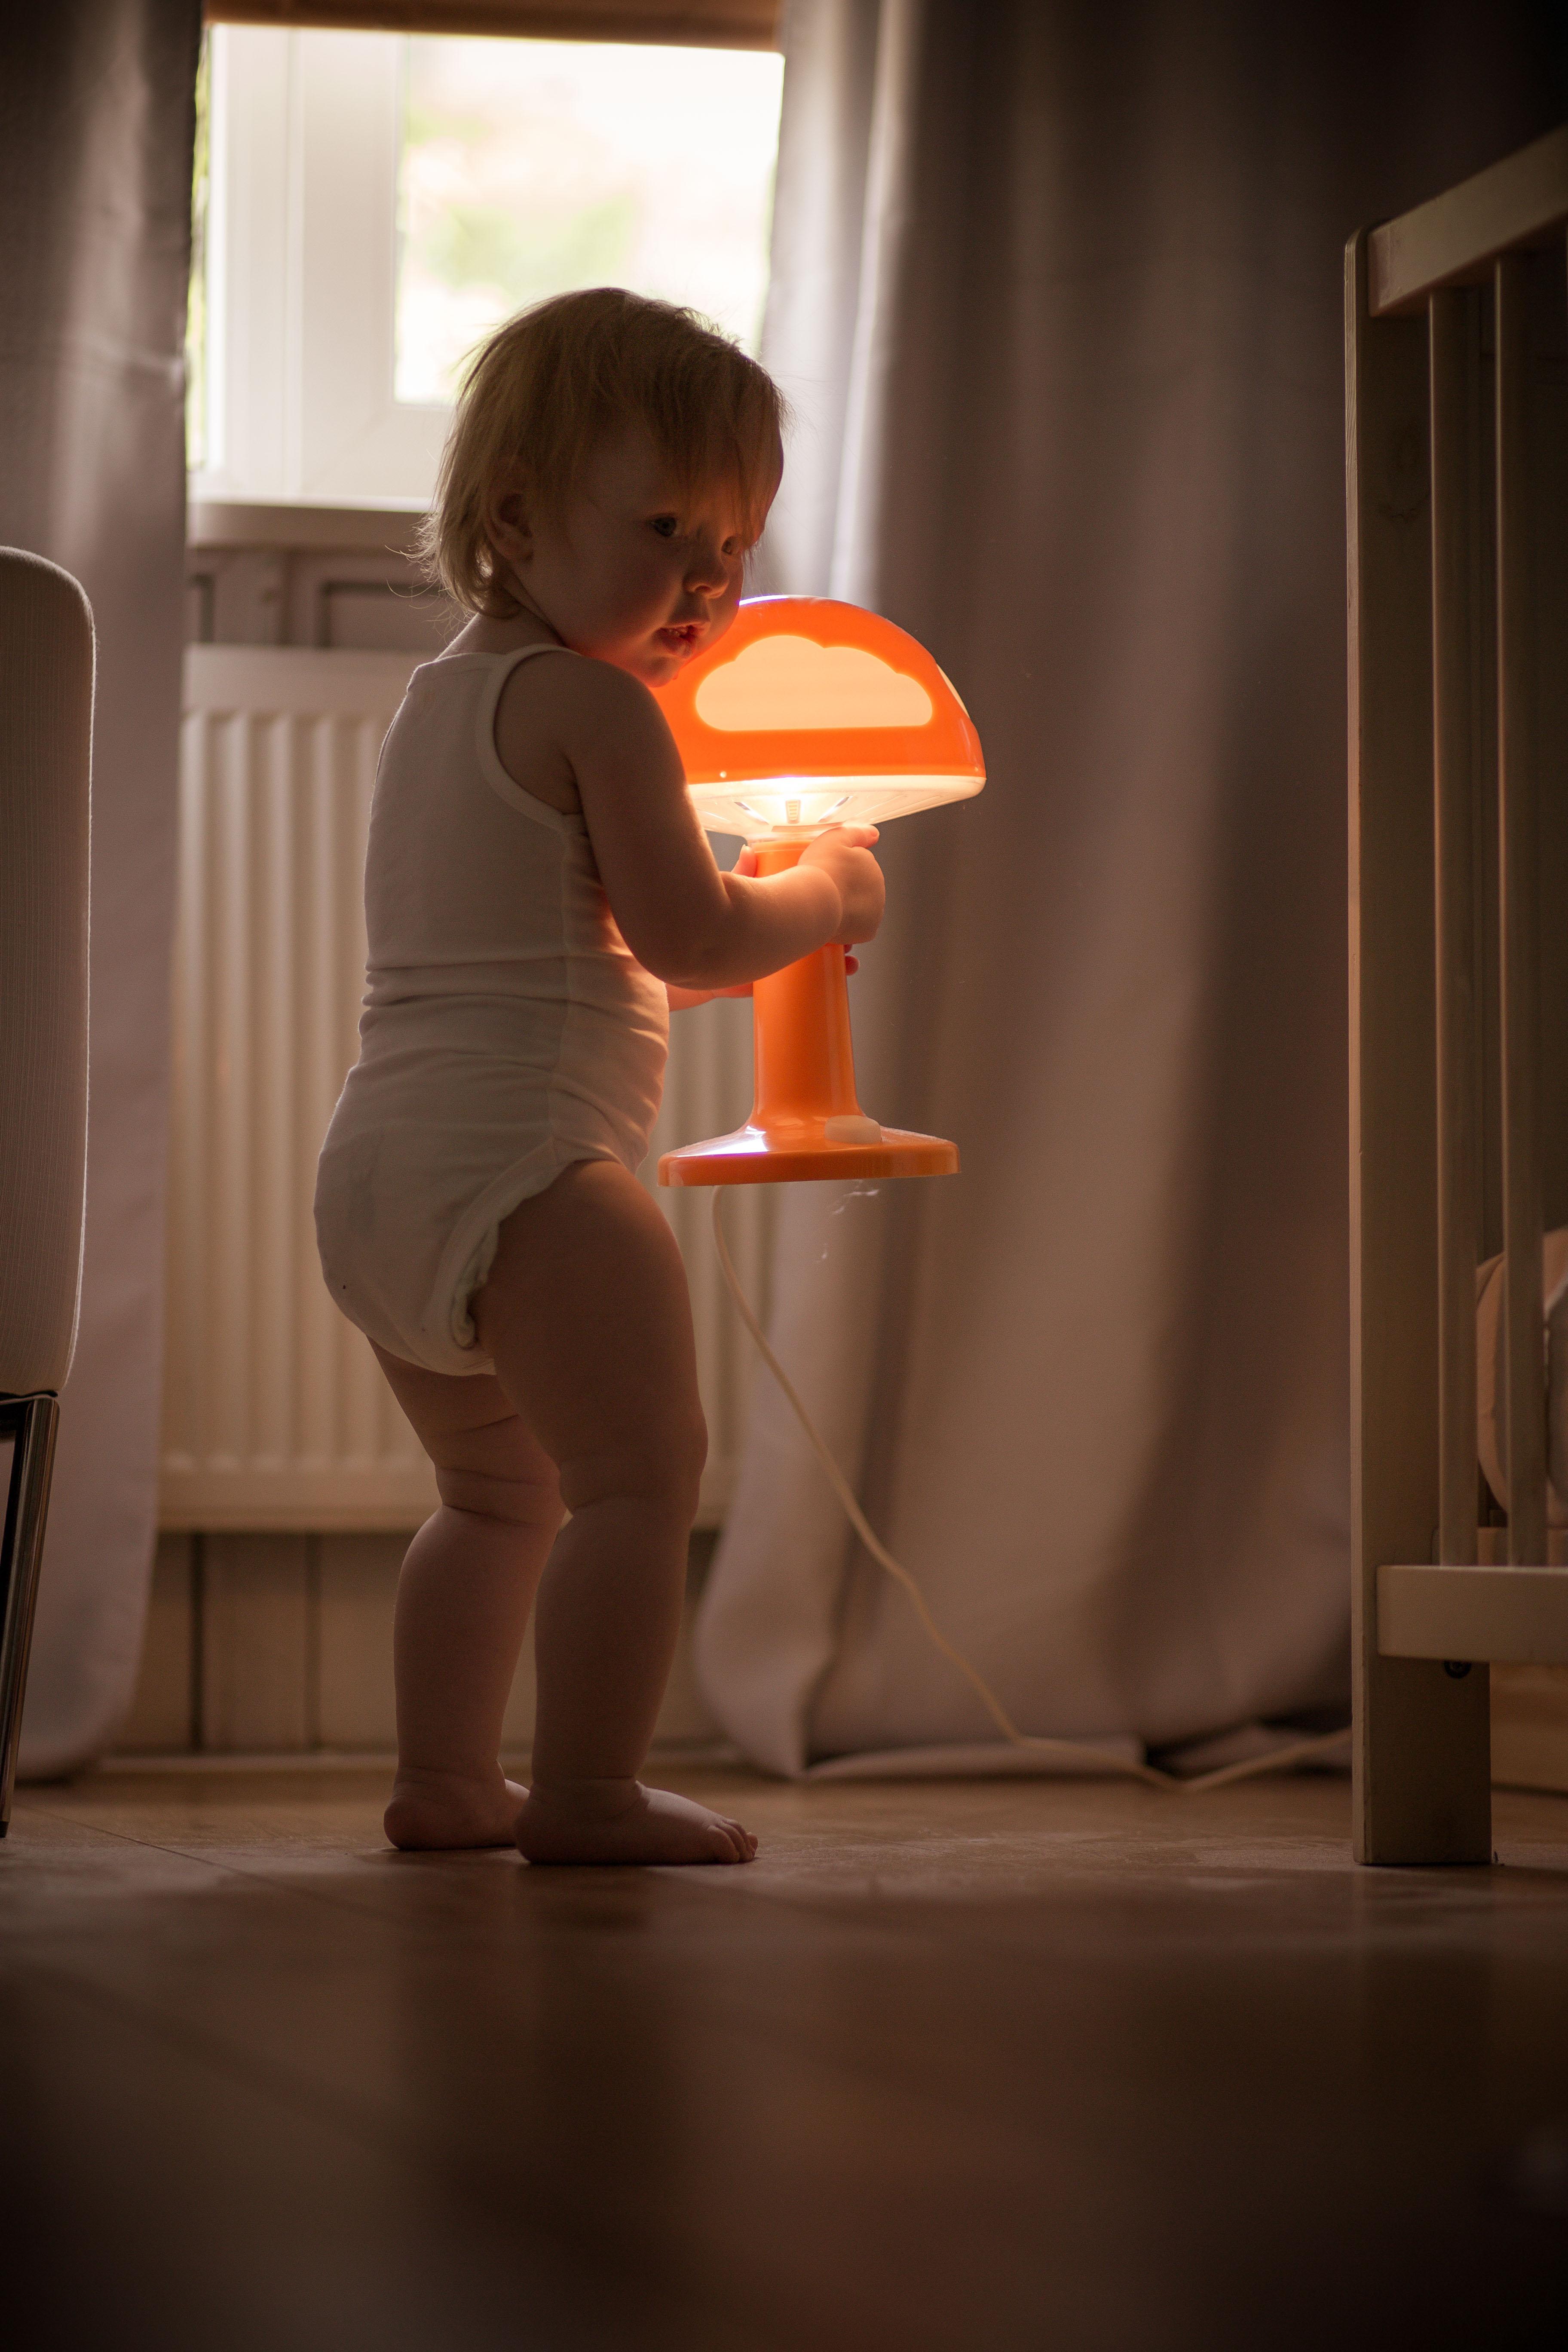 Mijn lamp!